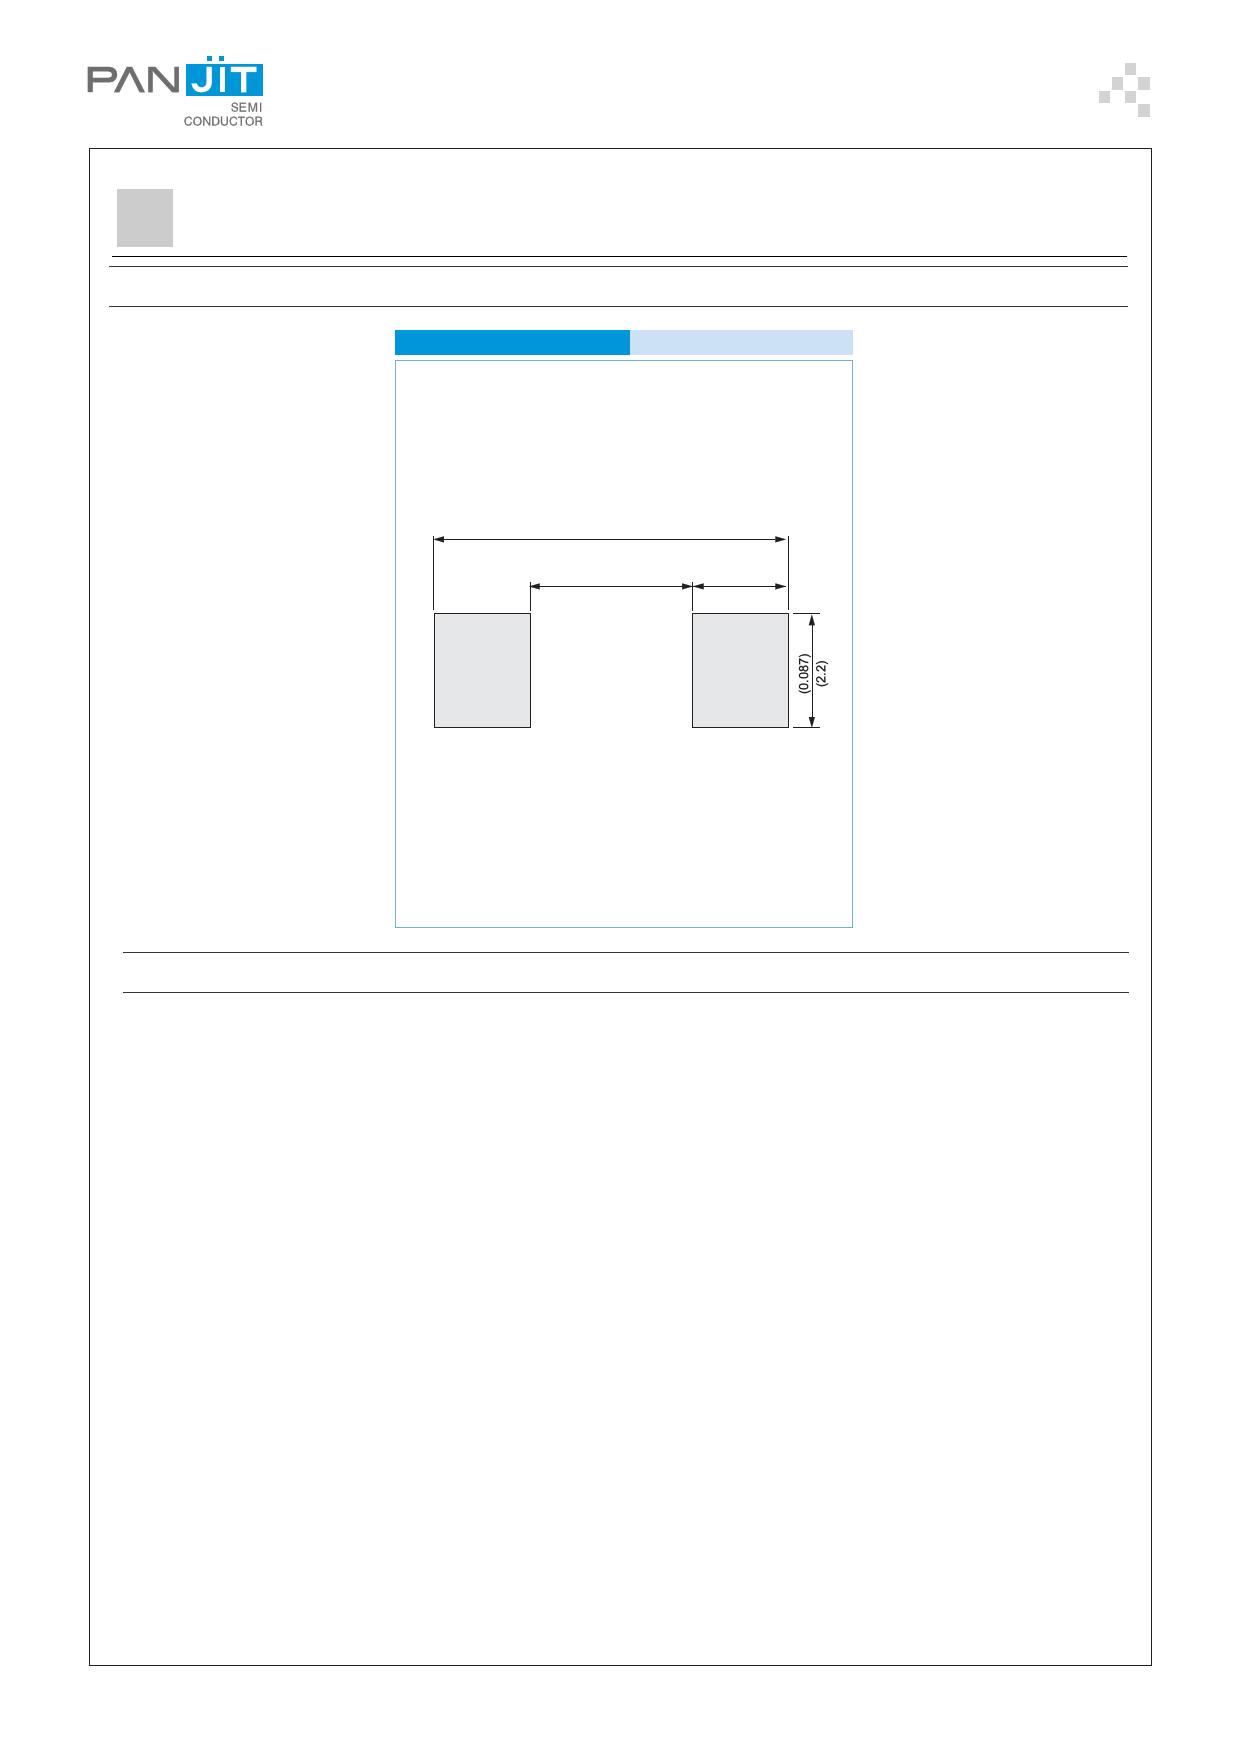 UF2JF pdf, 반도체, 판매, 대치품